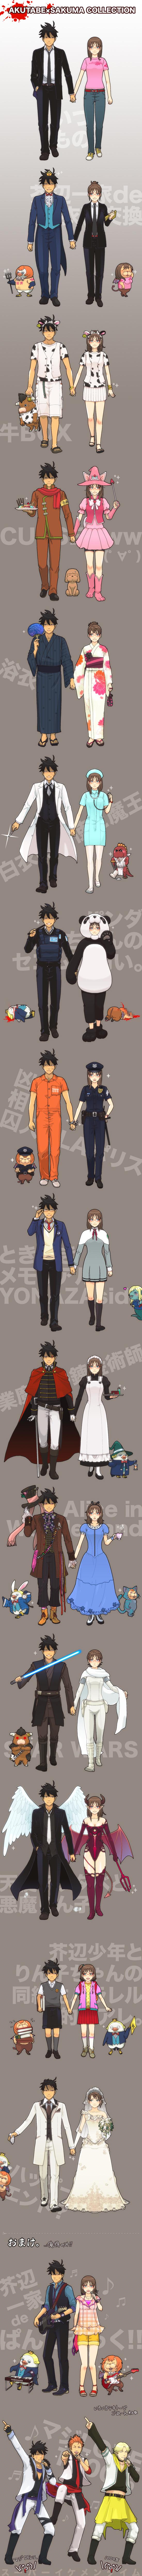 Tags: Anime, Sauzando, Star Wars, Alice in Wonderland, Yondemasuyo Azazel-san, Uta no☆prince-sama♪, Moloch, Beelzebub (Yondemasuyo Azazel-san), Sakuma Rinko, Azazel, Salamander (Yondemasuyo Azazel-san), Akutabe, Undine (Yondemasuyo Azazel-san)